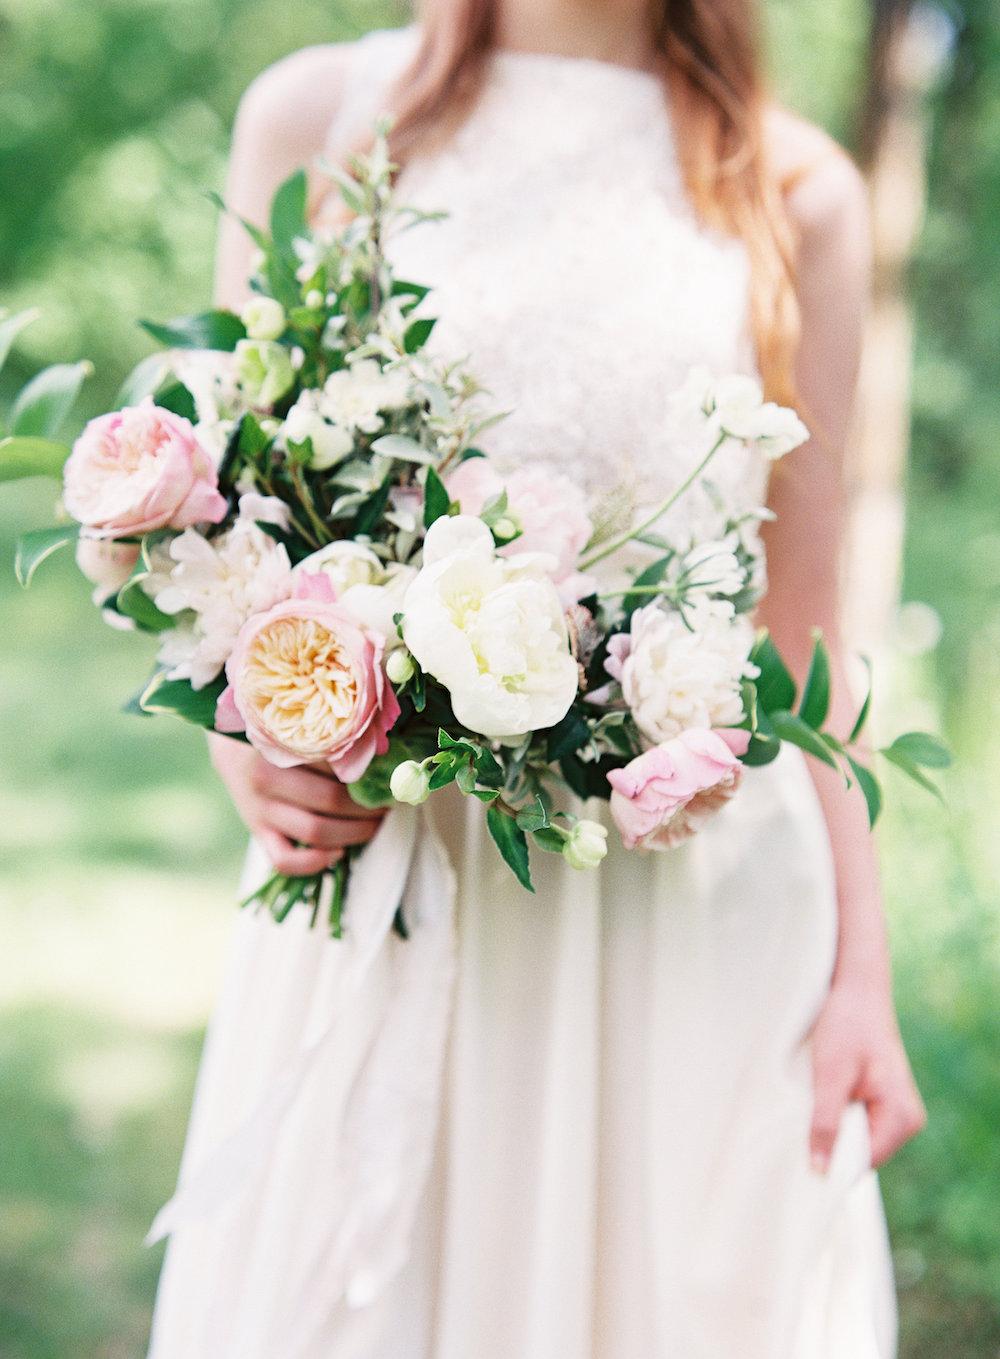 Blush Wedding Bouquet - Winnipeg Wedding Florist